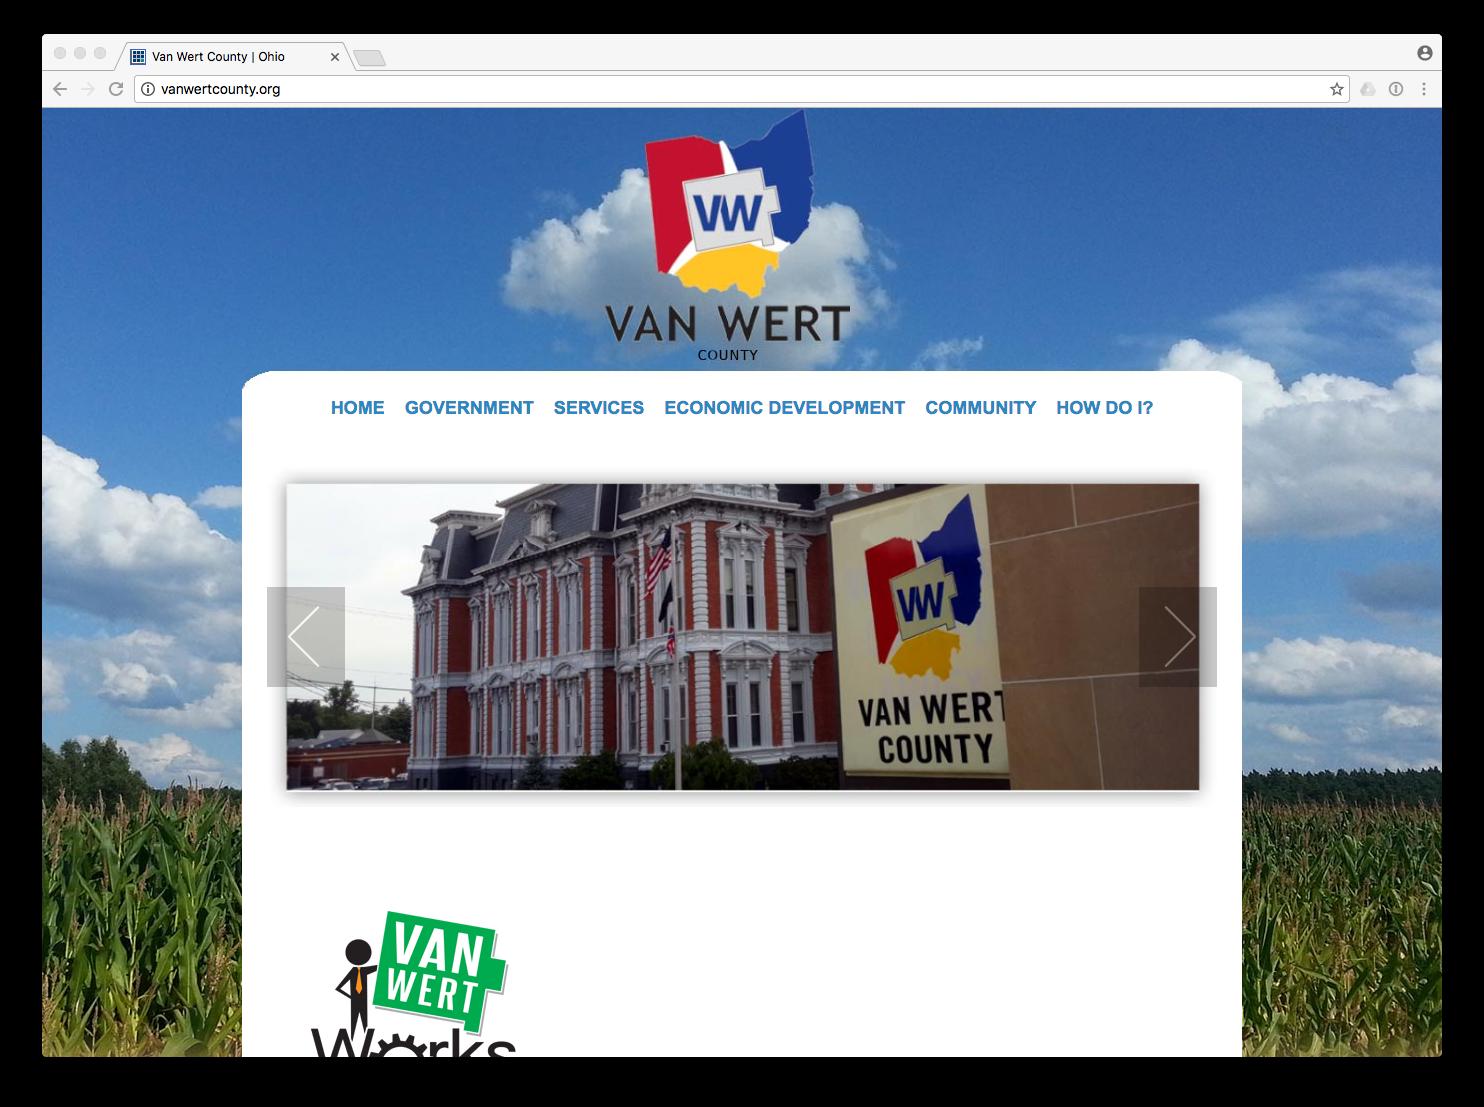 http://vanwertcounty.org